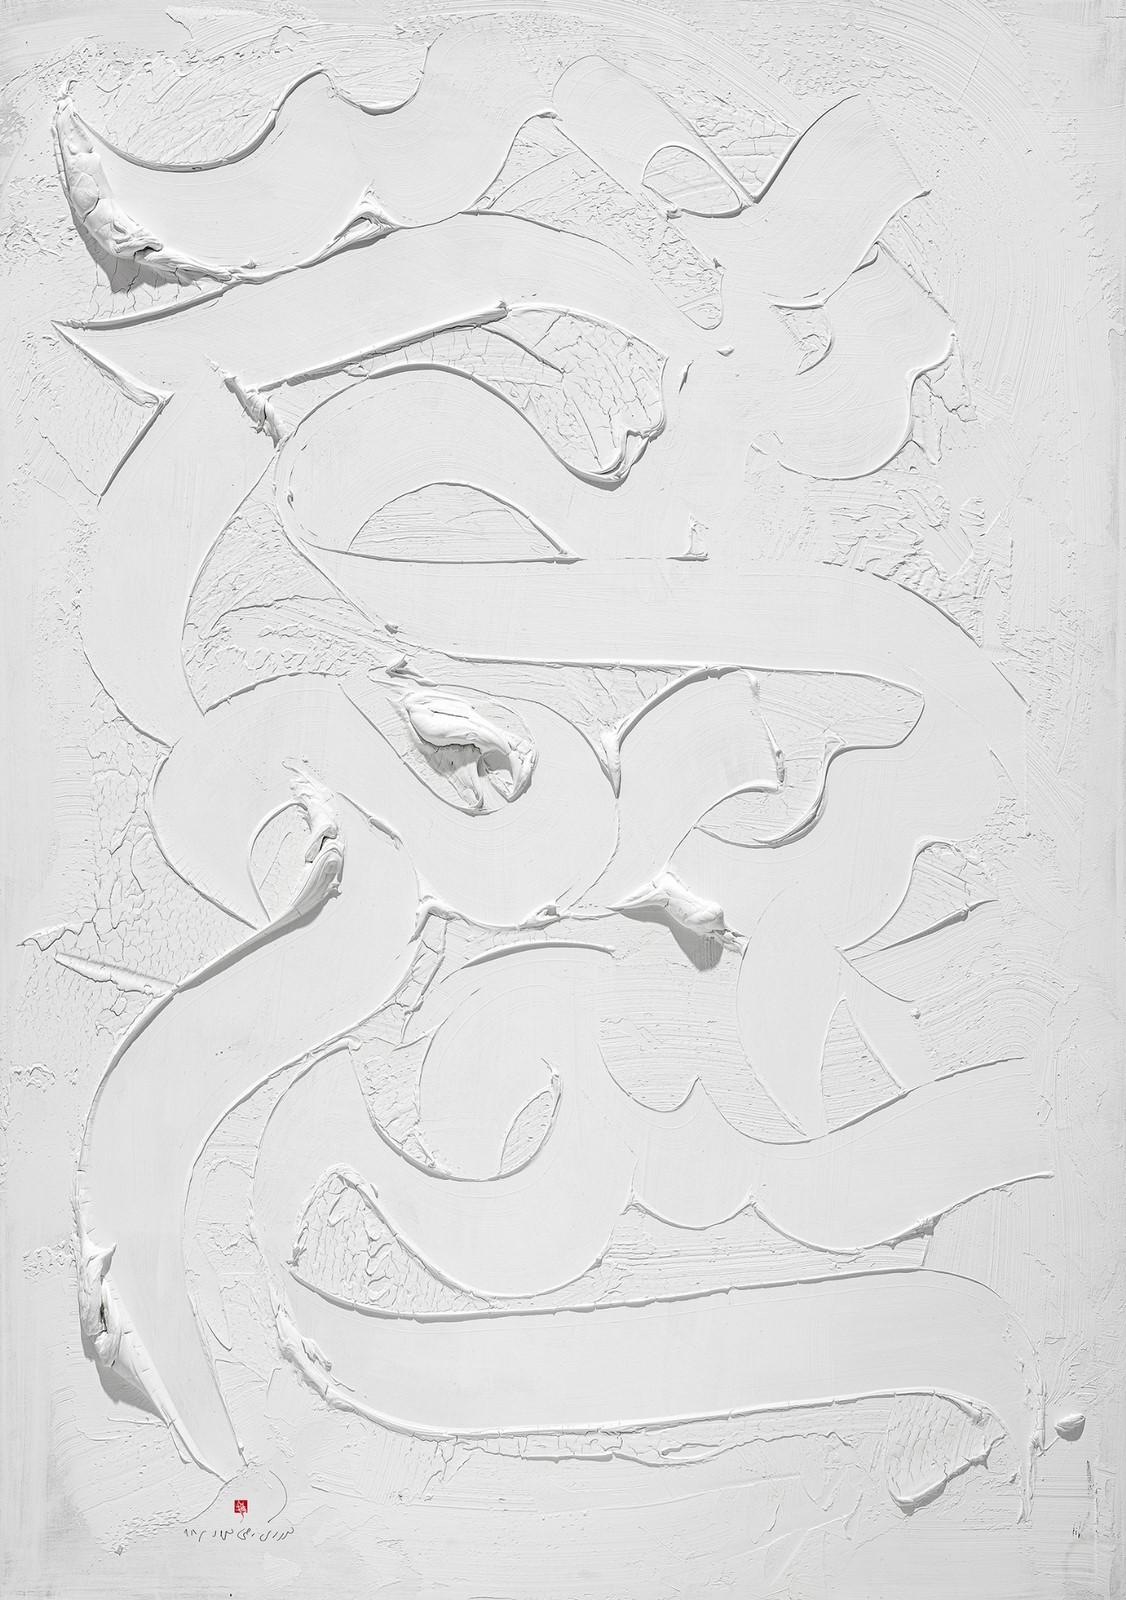 "<p>""Beyaz Üzerine Beyaz Serisi"" 70 x 100 cm, Ahşap Üzerine Karışık Teknik, 2019.<br /><em>""White on White Series"",</em><em>70 x 100 cm, Mixed Media on Wood, 2019.</em></p>"